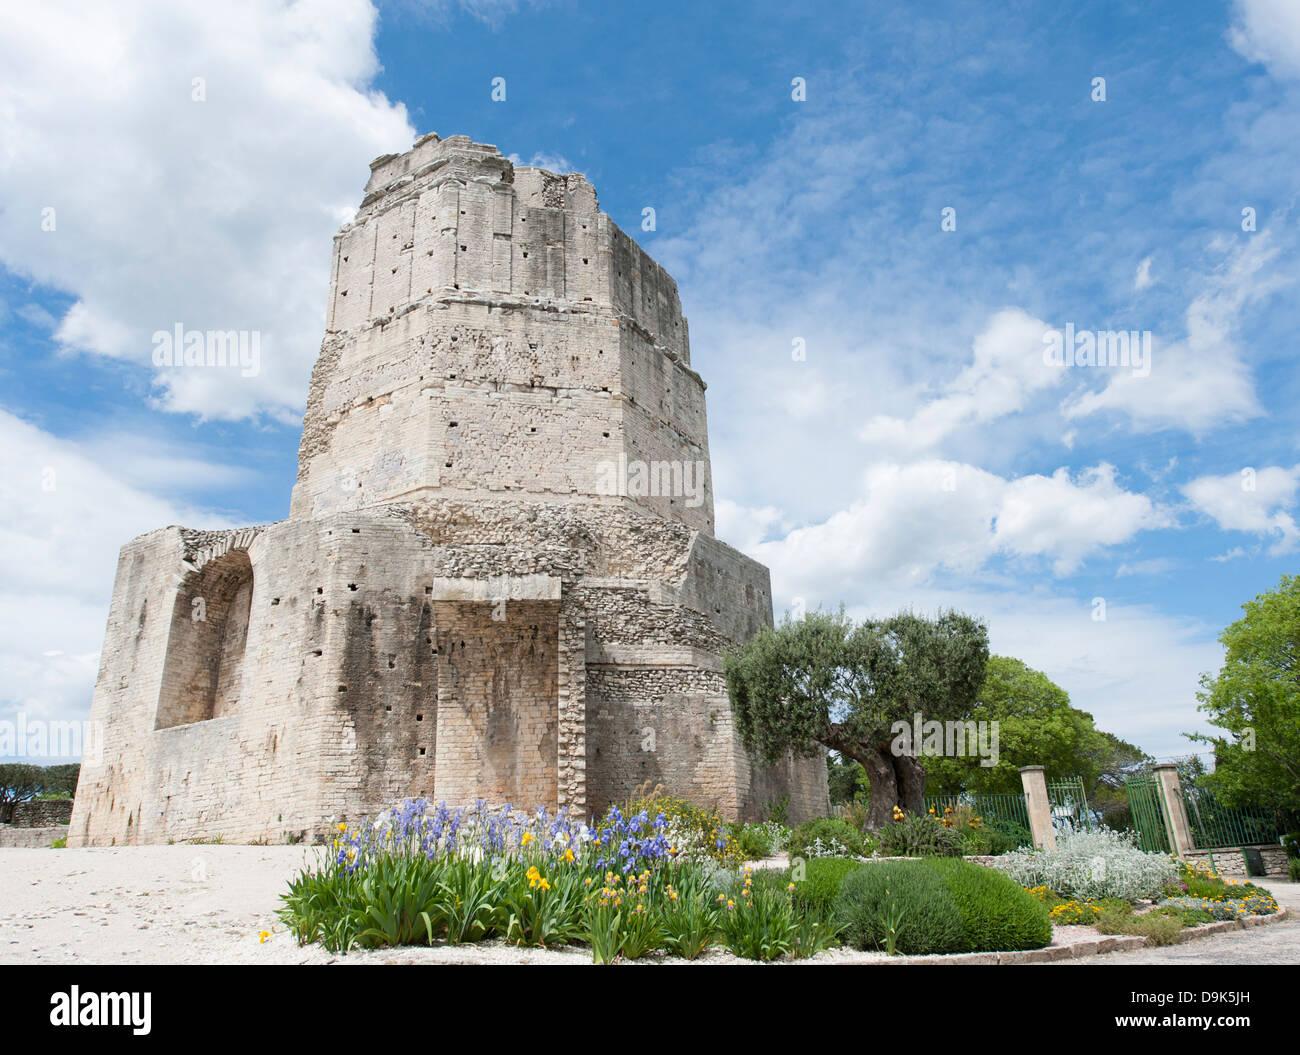 Tour Magne, Roman tower and landmark in the Jardins de la Fontaine, Nîmes, Gard, Languedoc, France - Stock Image